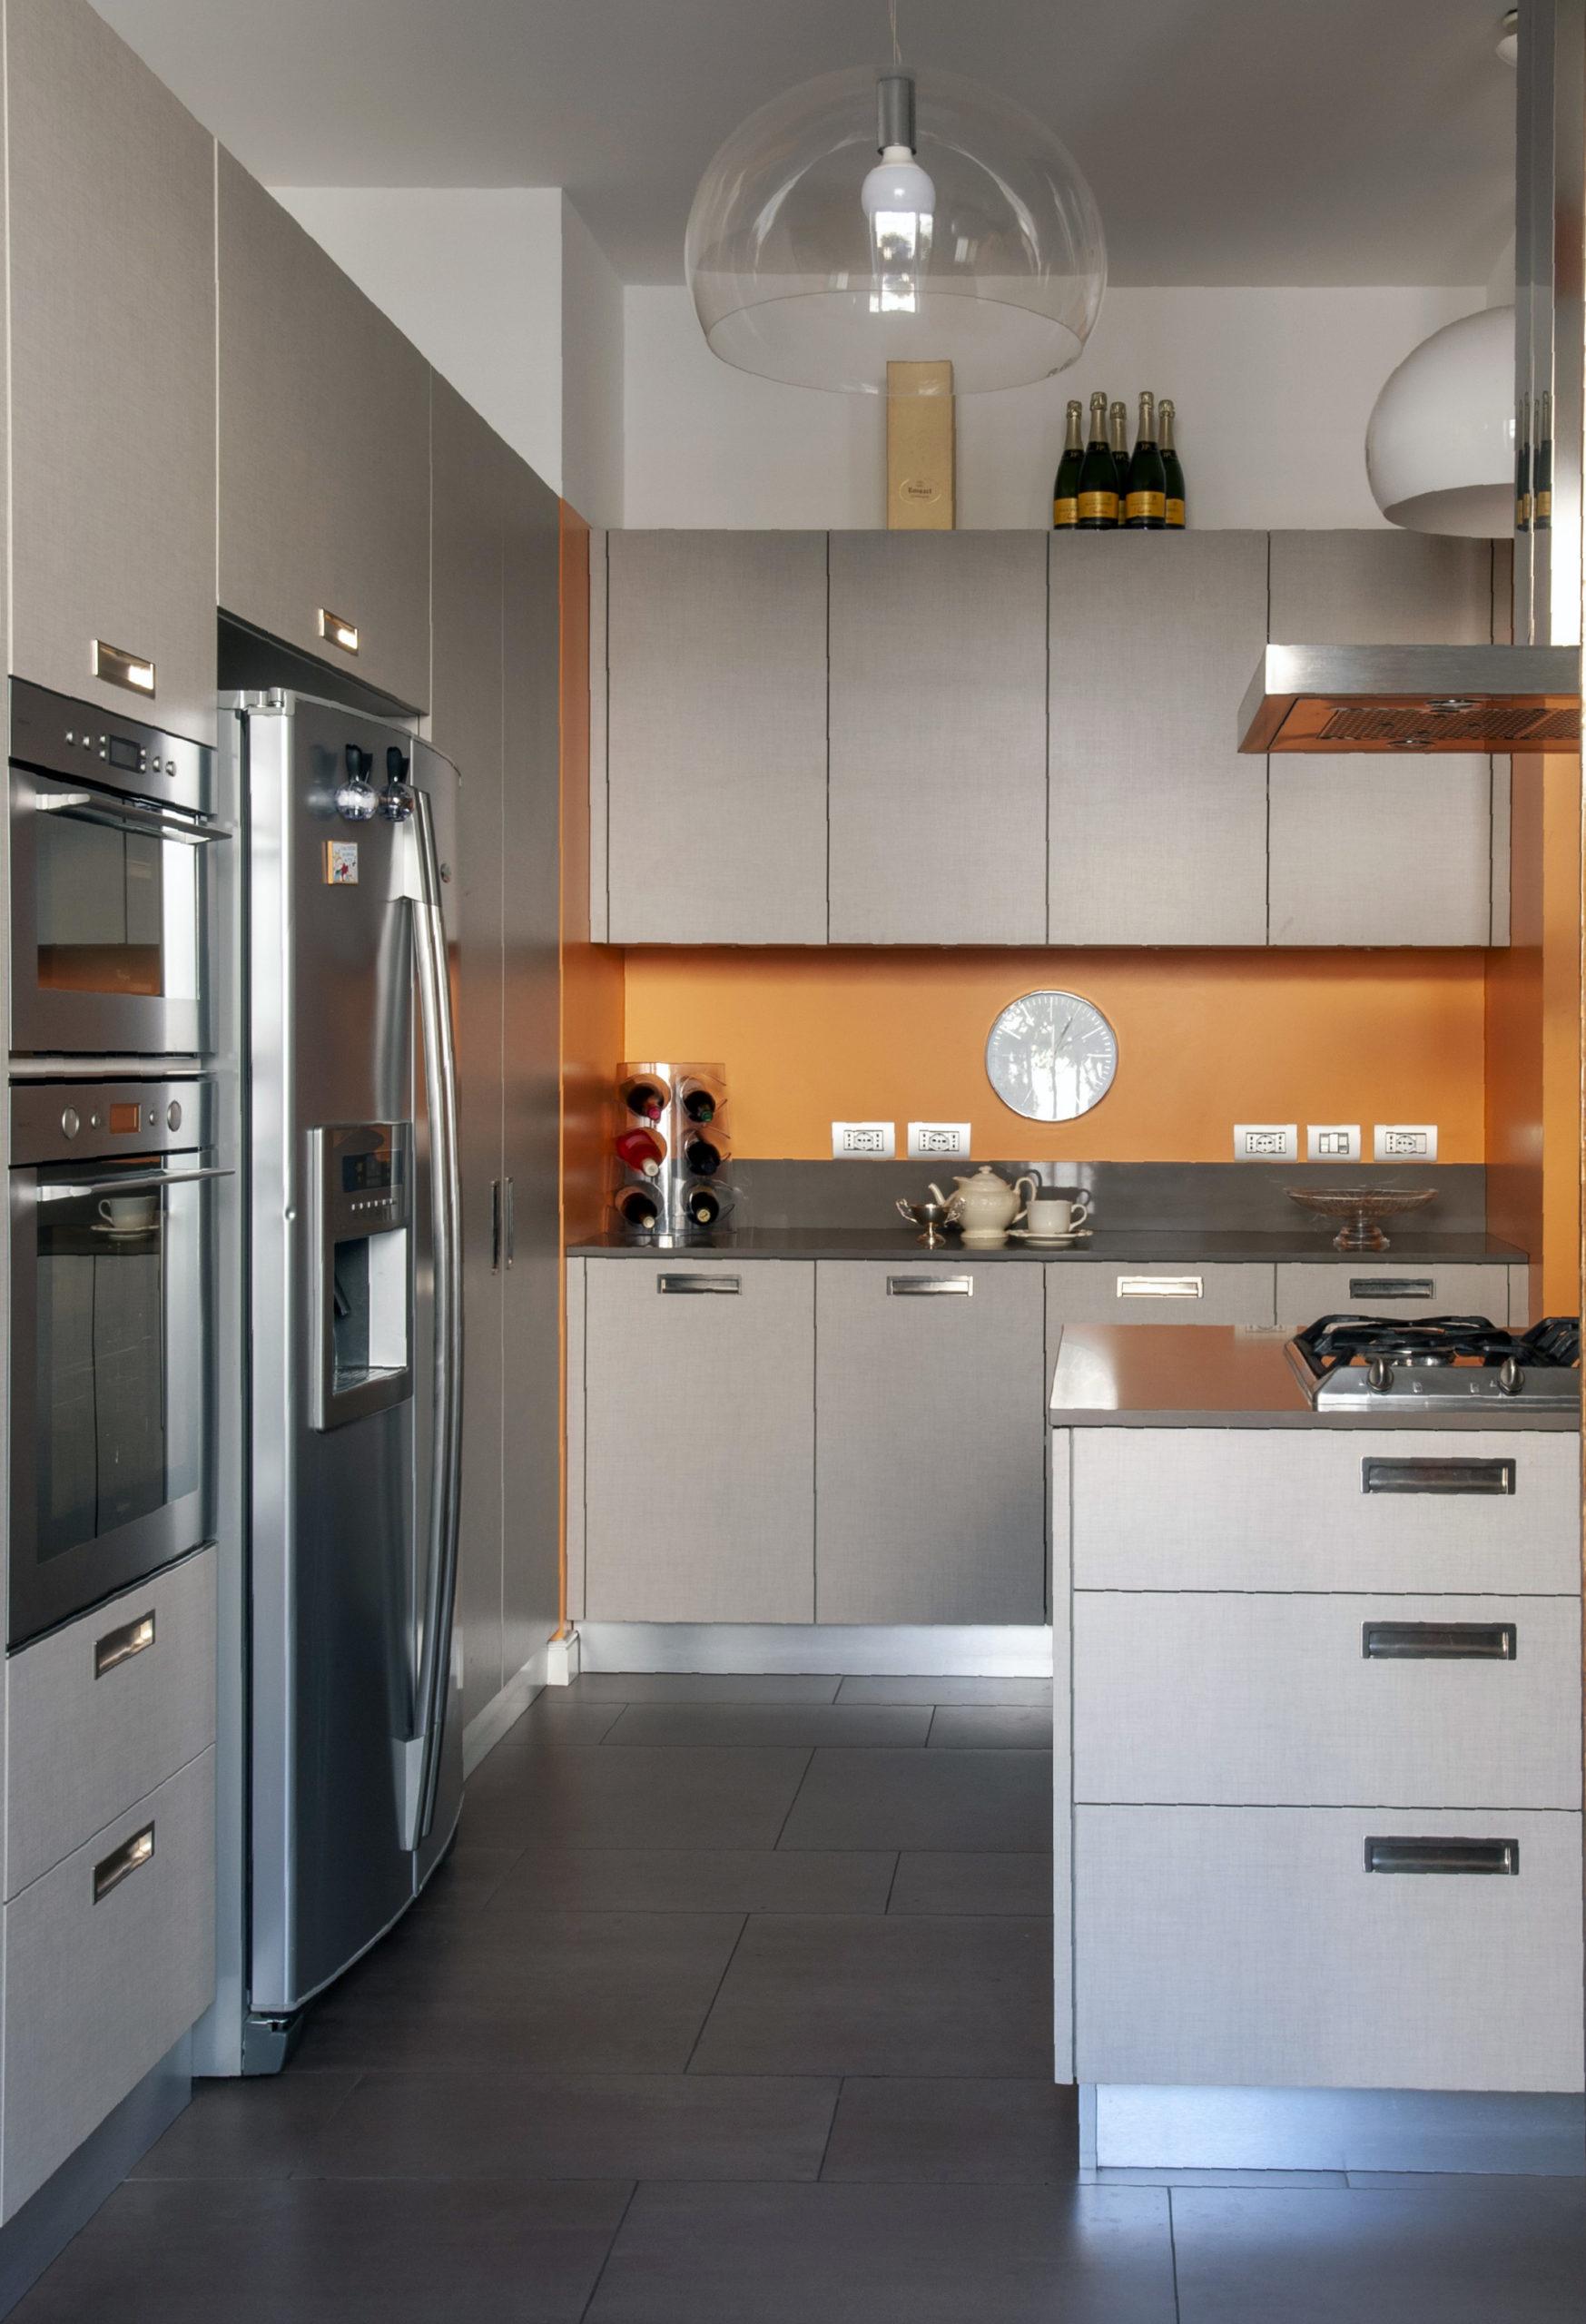 012-cucina